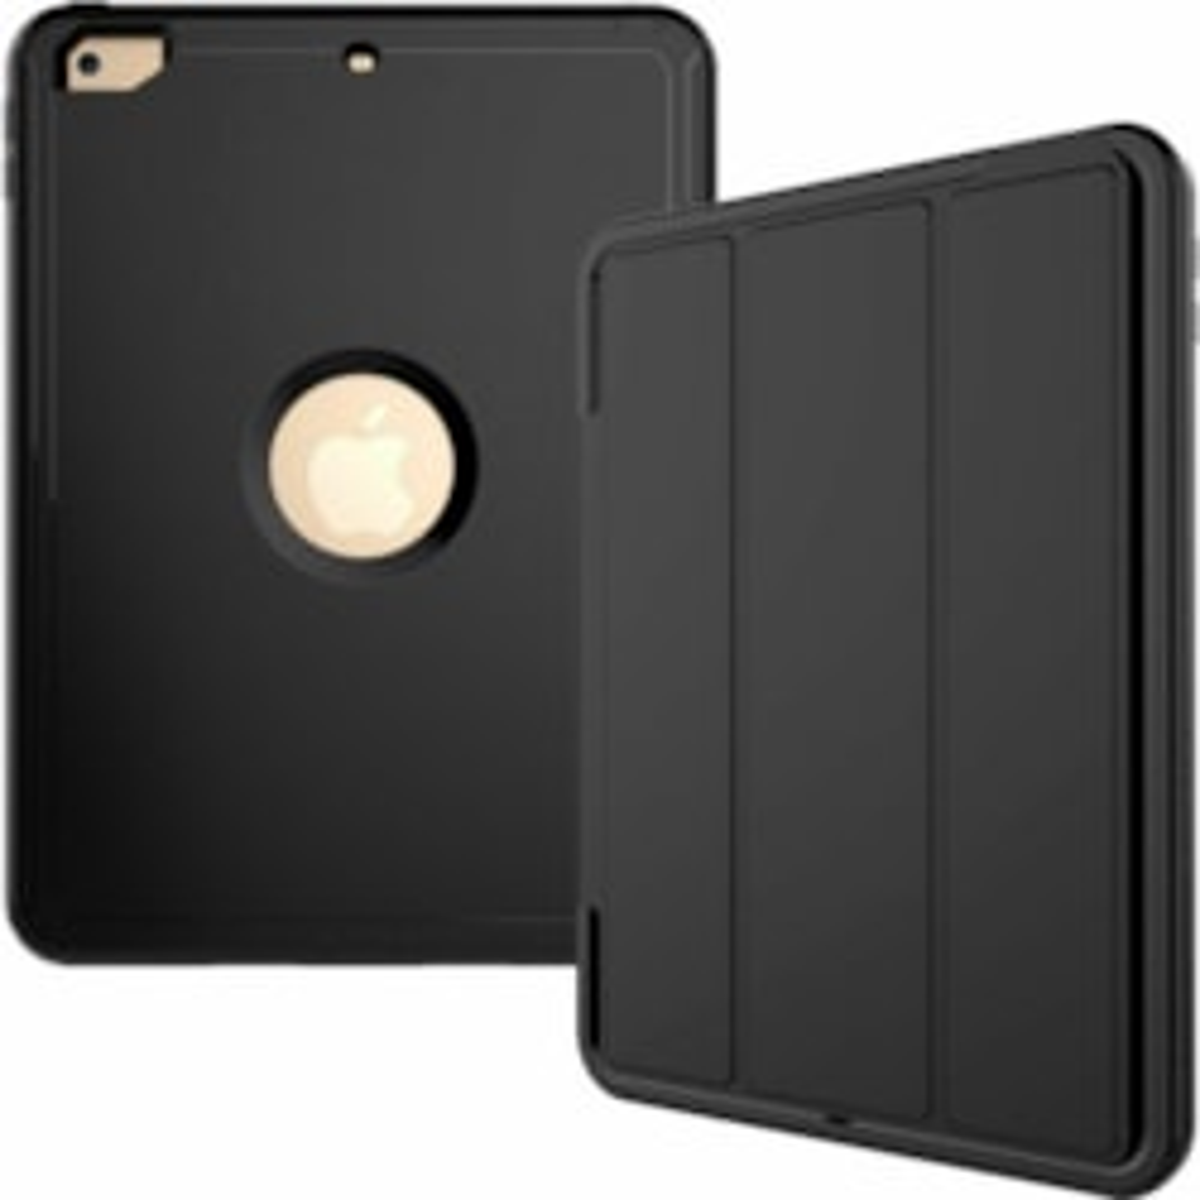 iPad 9.7 2018 2017 6th Gen Shockproof Full Protective Cover Hybrid Hard Case black